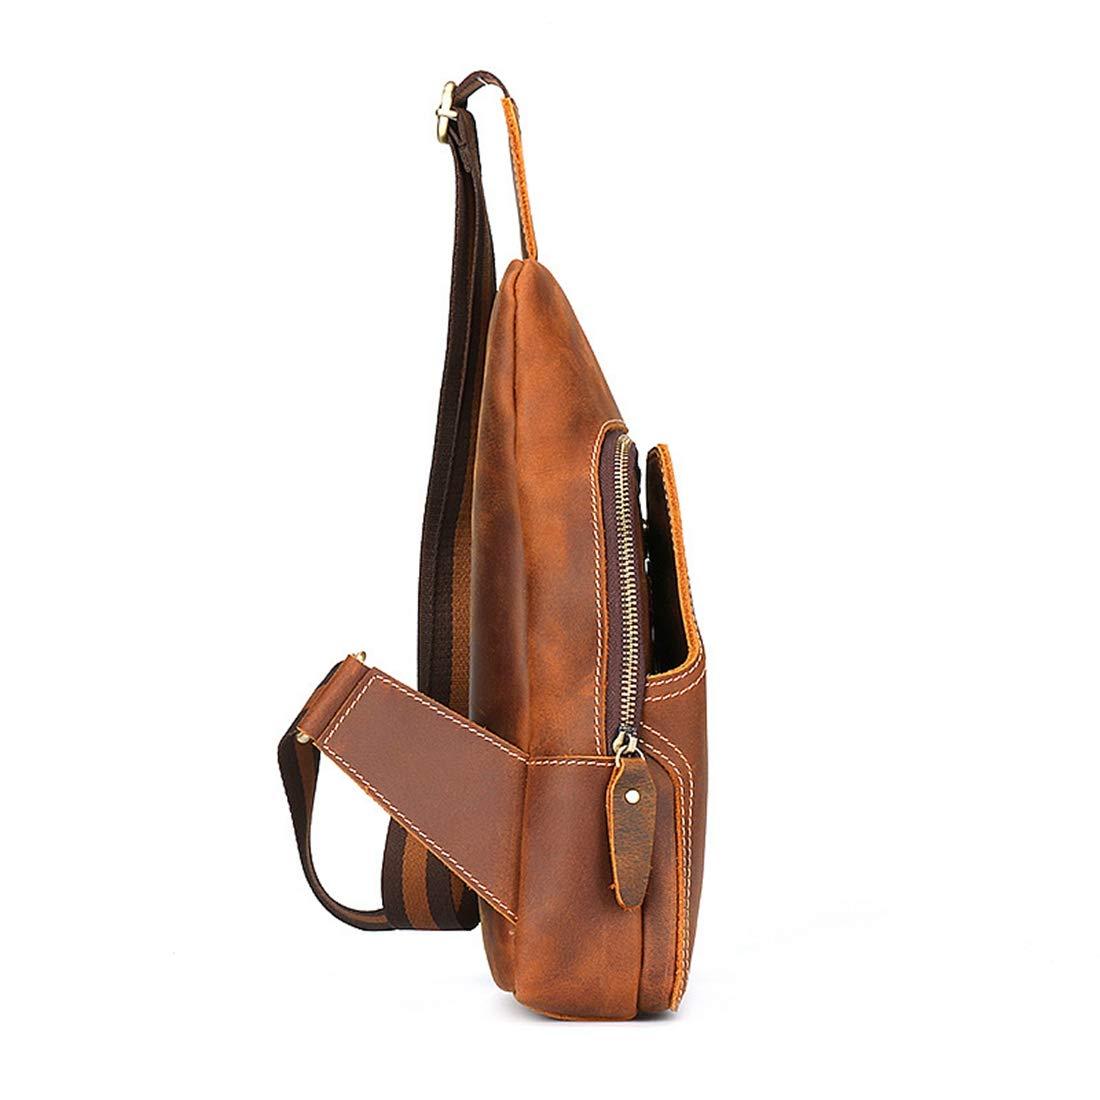 Color : Brown RABILTY Men Chest Bag Genuine Leather Waist Bag Vintage Handmade Bag Crossbody Bag Sports and Leisure Business Travel Bag